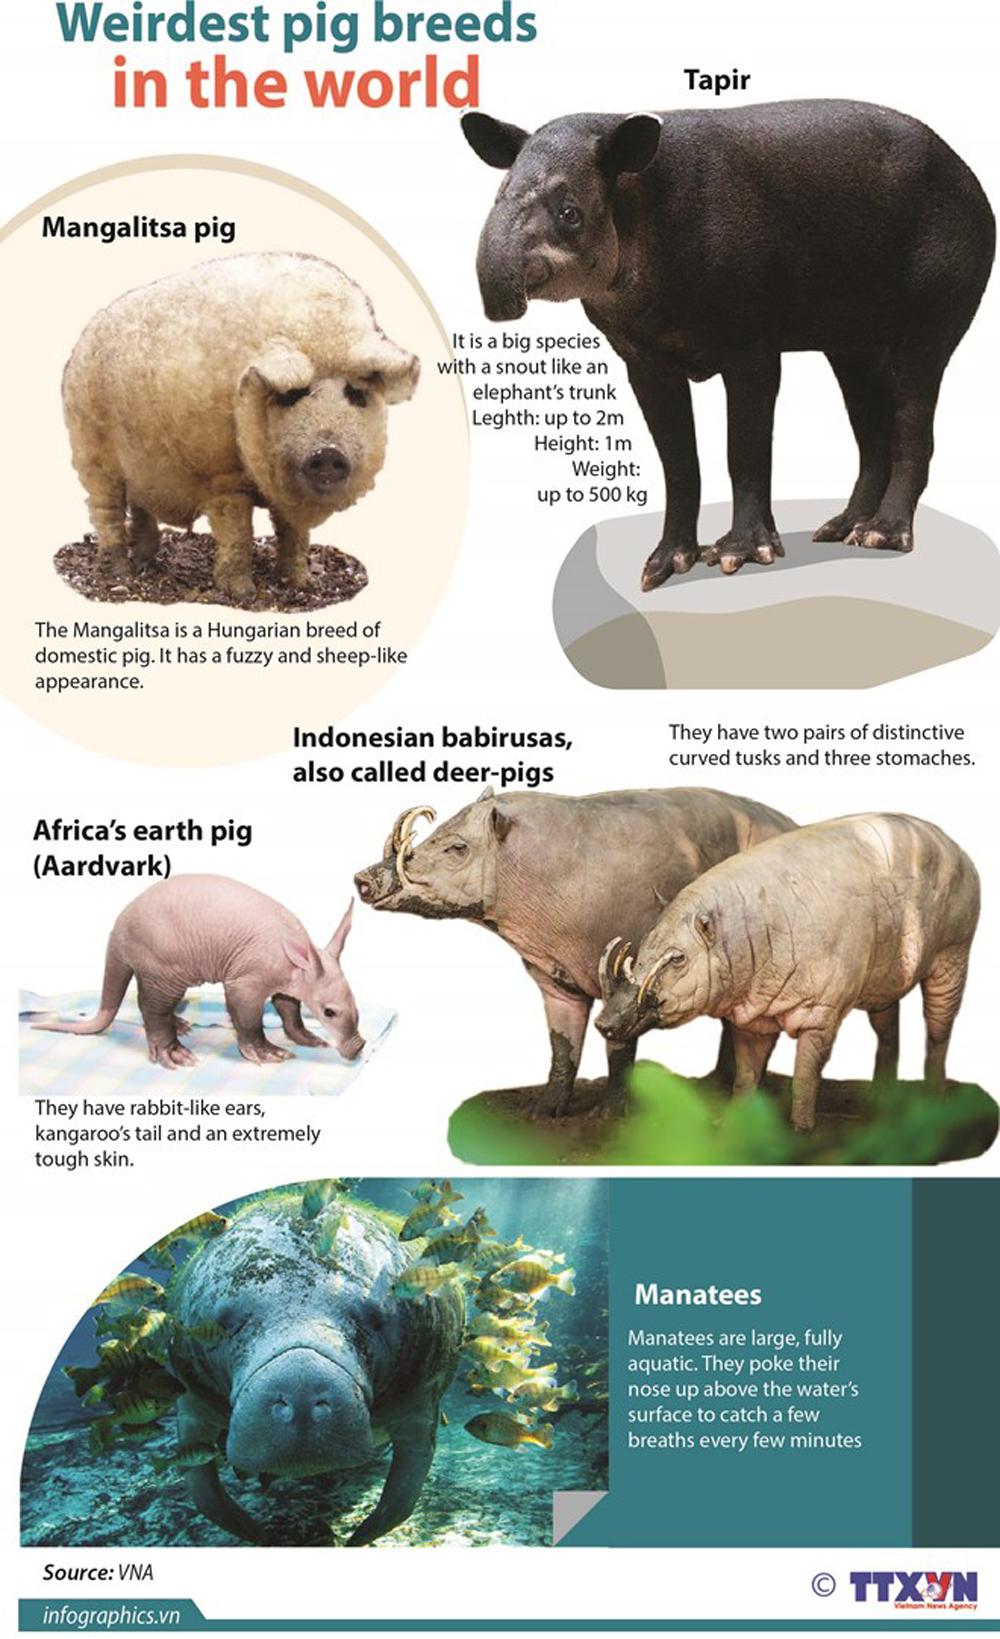 Weirdest pig breeds, year of the pig, tapir, mangalitsa pig, babirusas, earth pig, manatees